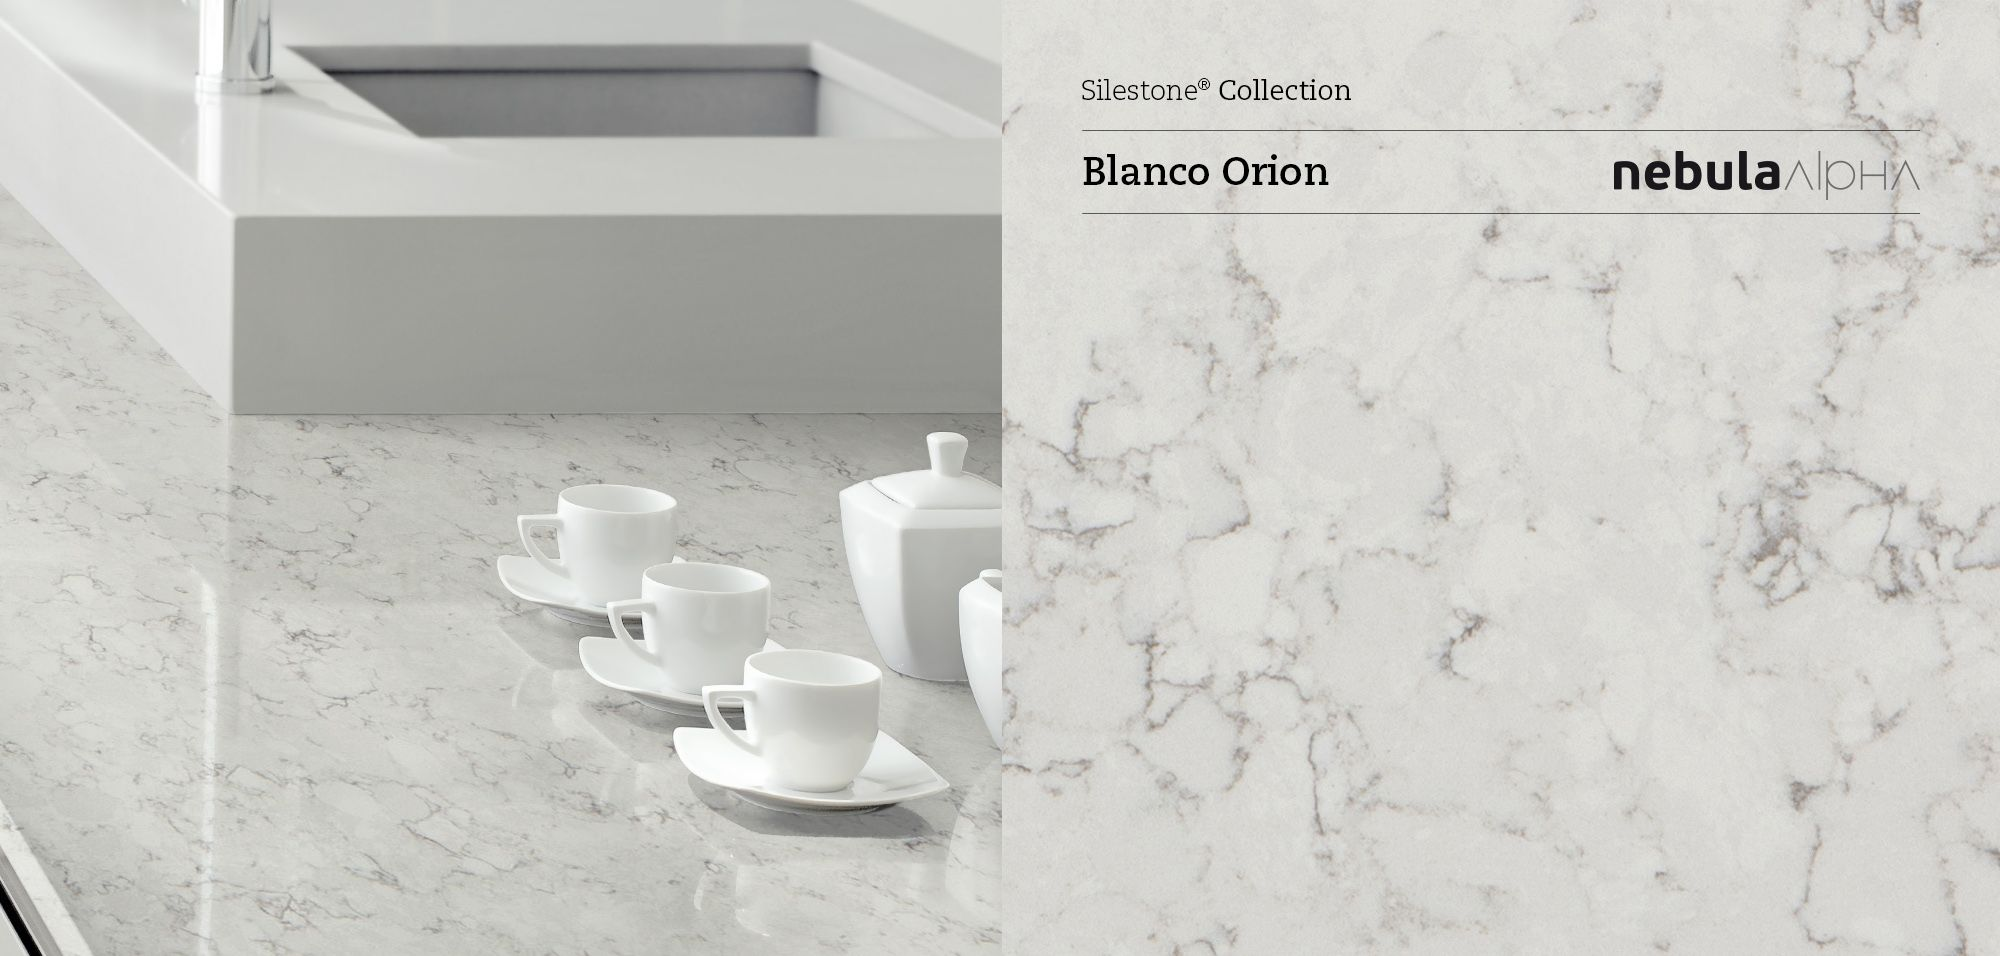 Silestone BLANCO ORION